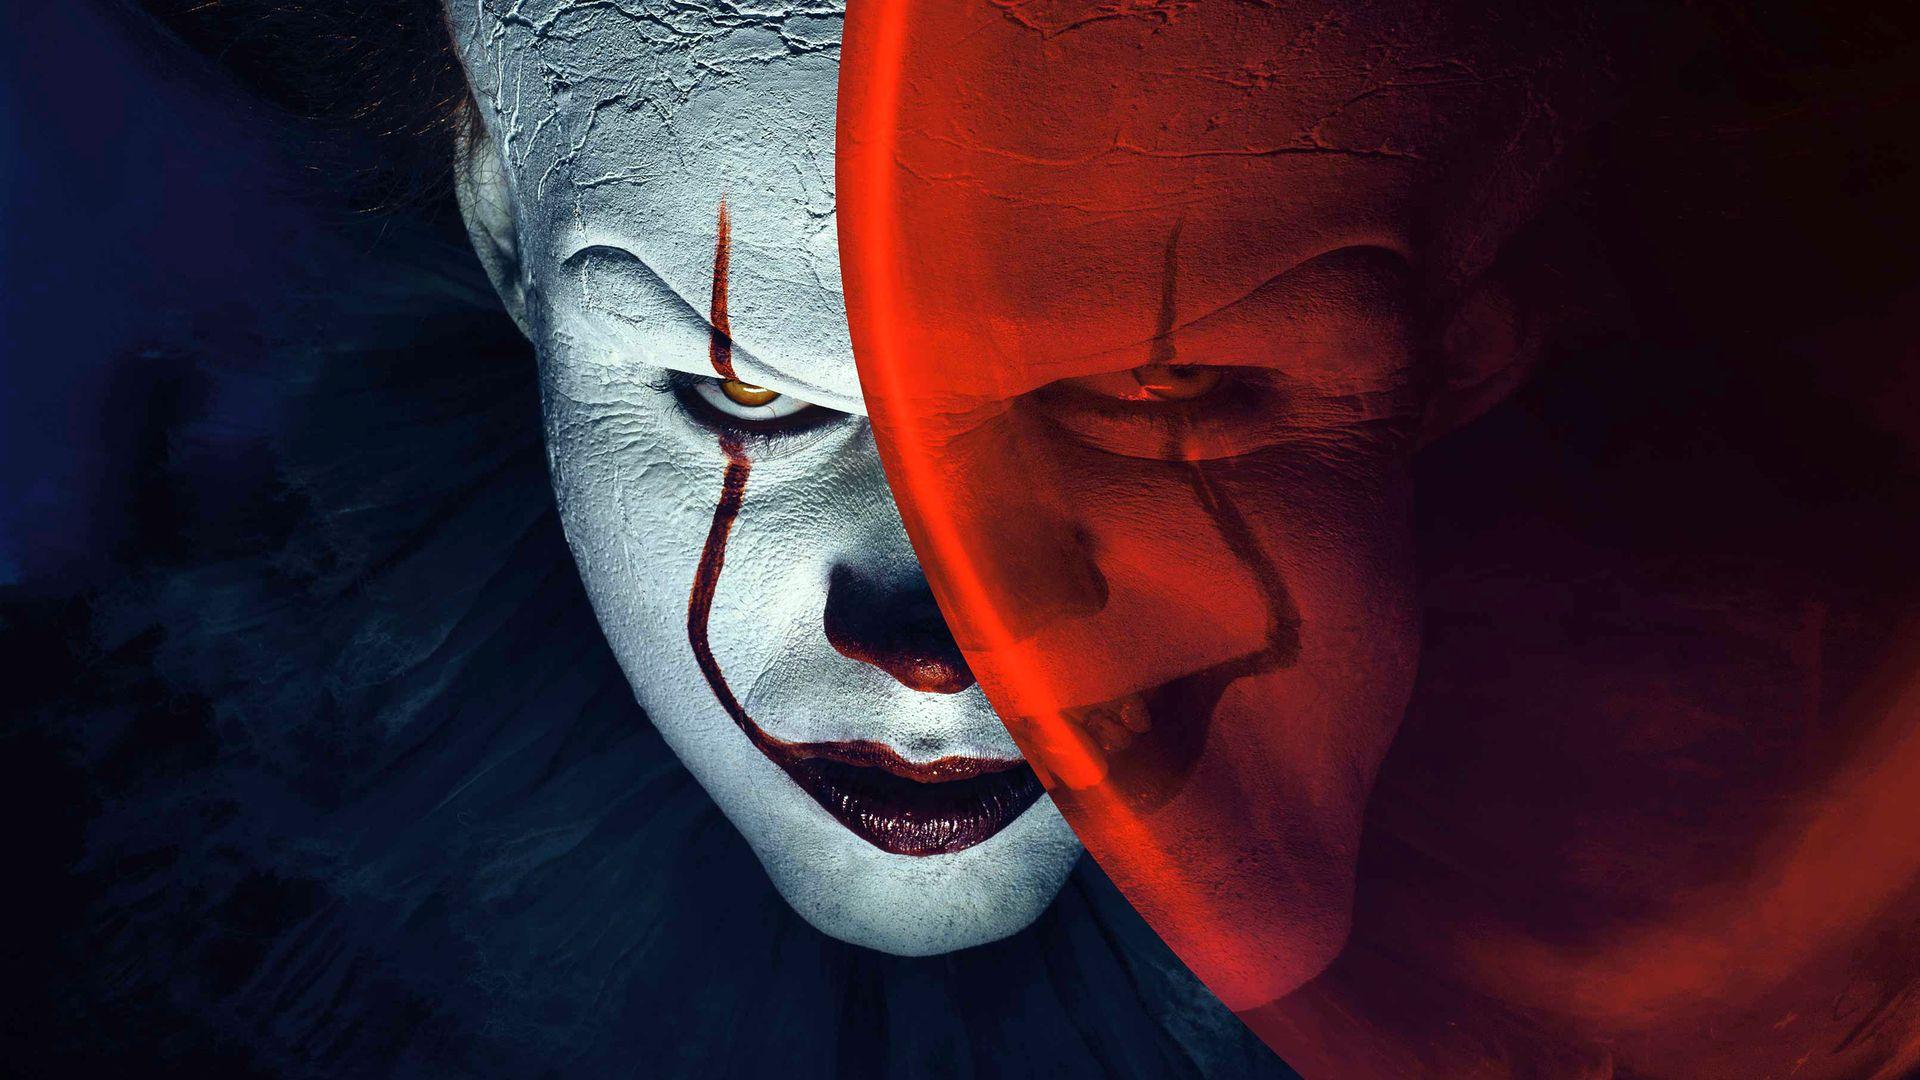 It's 2, Clown Poster PC Wallpaper HD